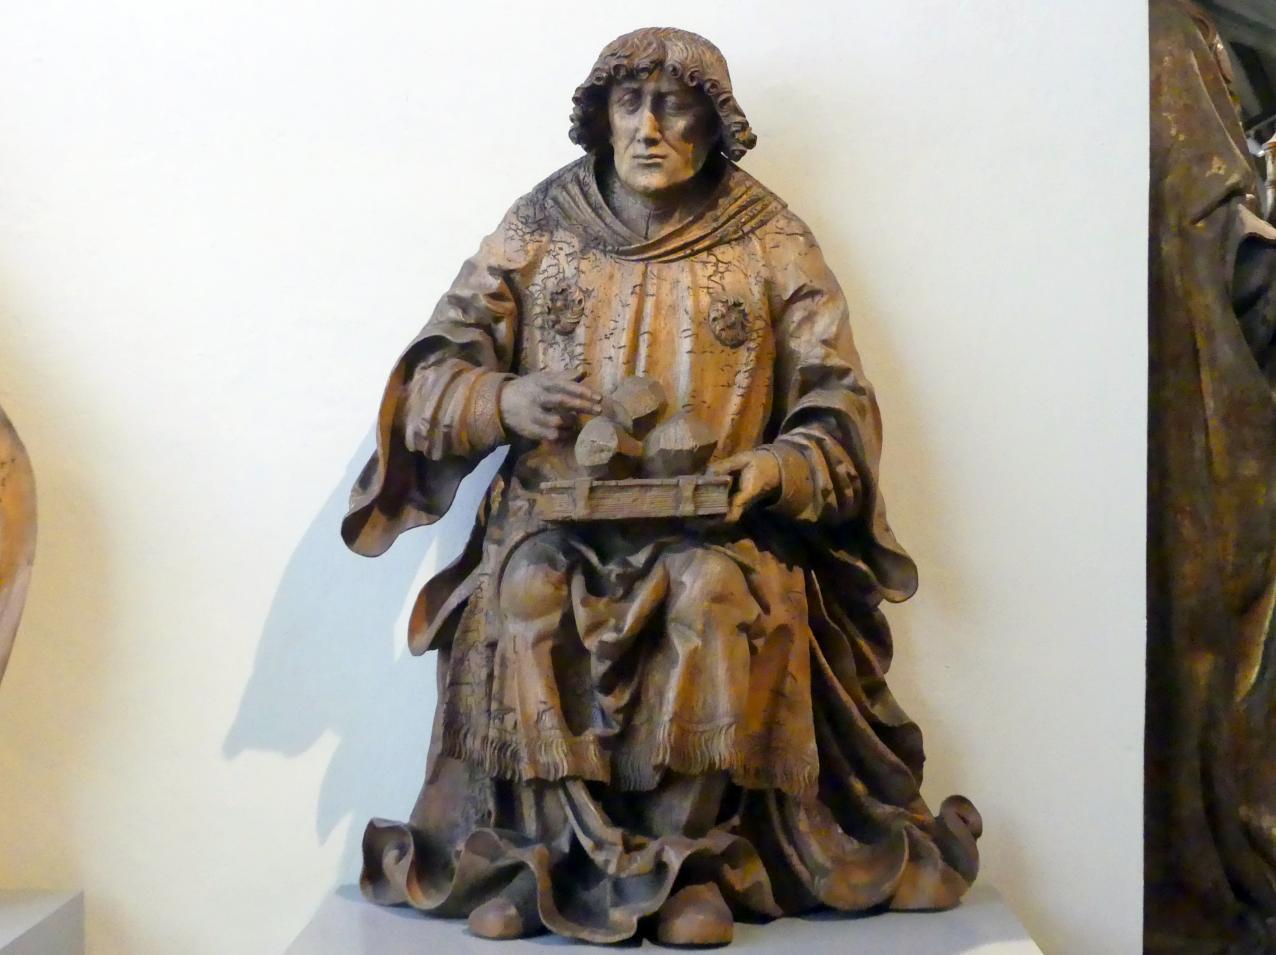 Meister der Altöttinger Türen (Matthäus Krinis?): Hl. Stephanus, Um 1520 - 1530